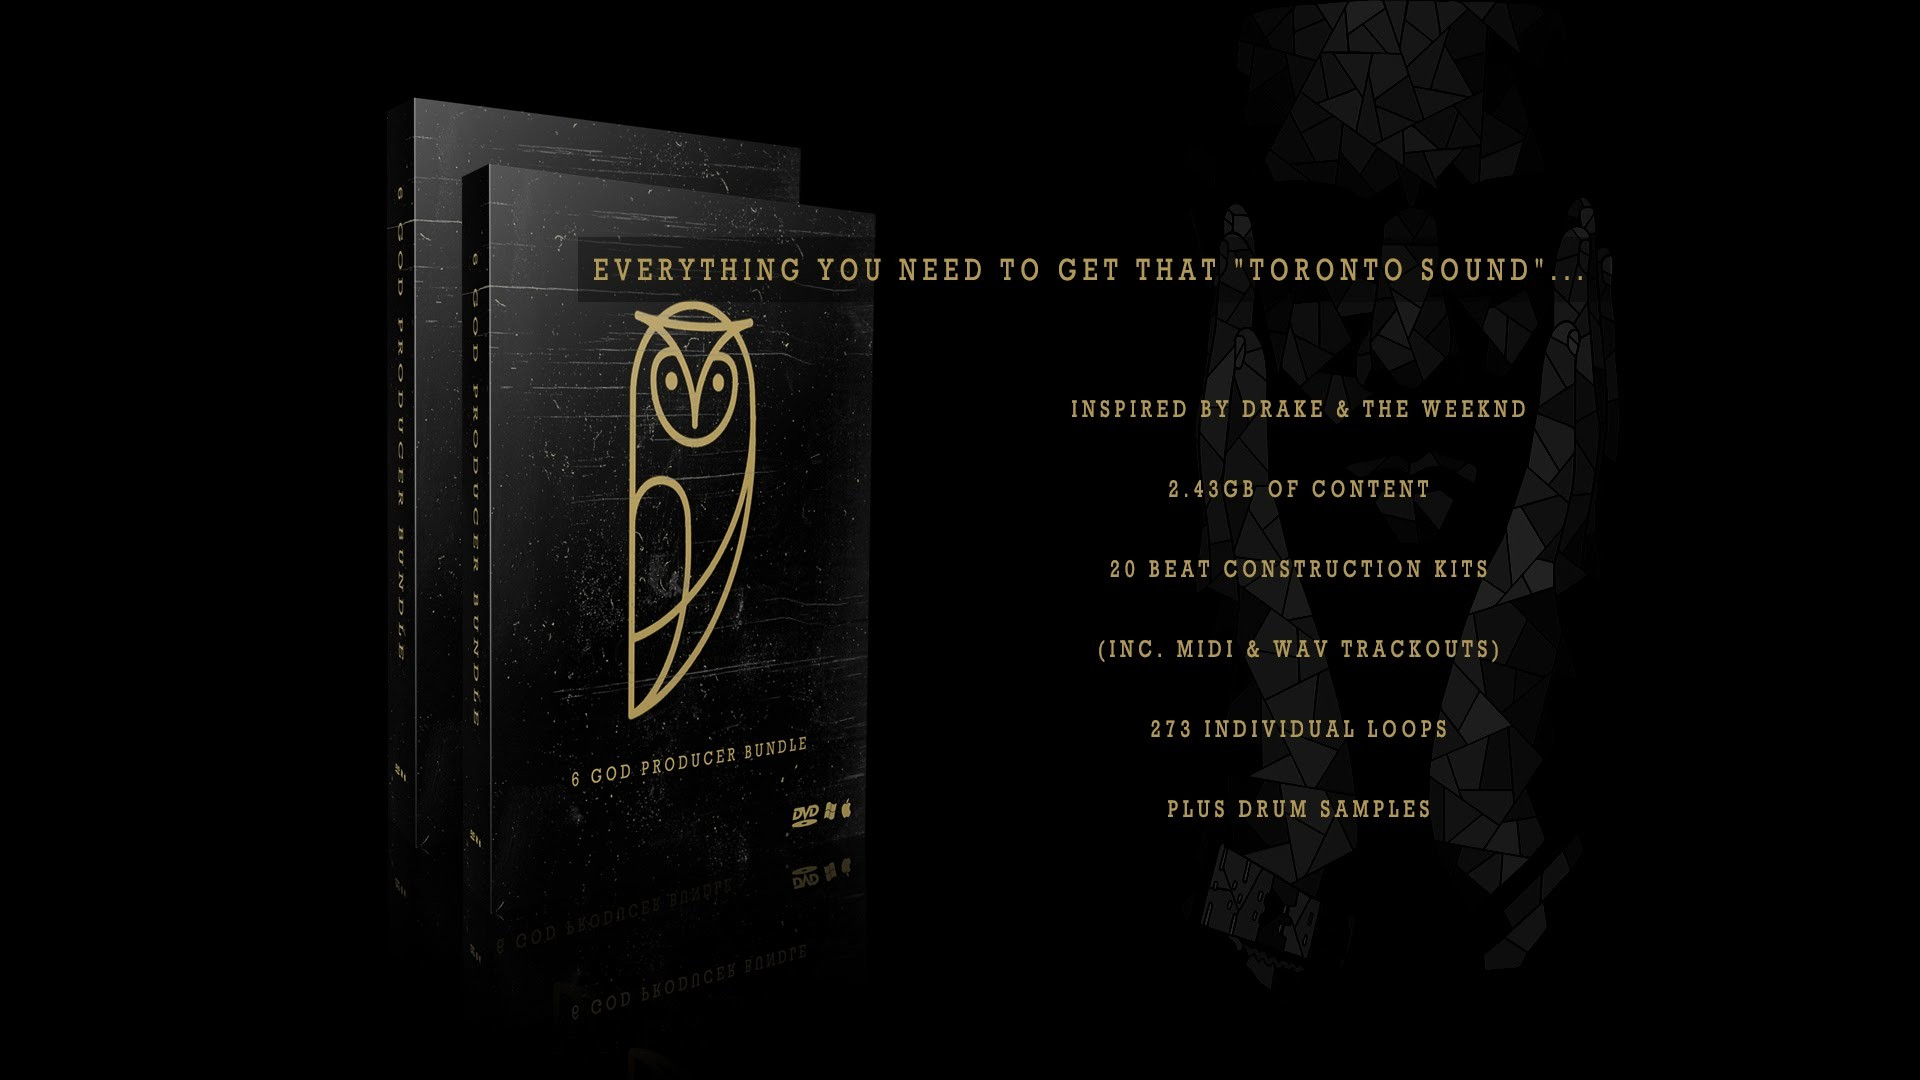 """6 God"" Producer Bundle (In the style of Drake / Noah 40 Shebib Sample Pack  & Drum Kit) – YouTube"